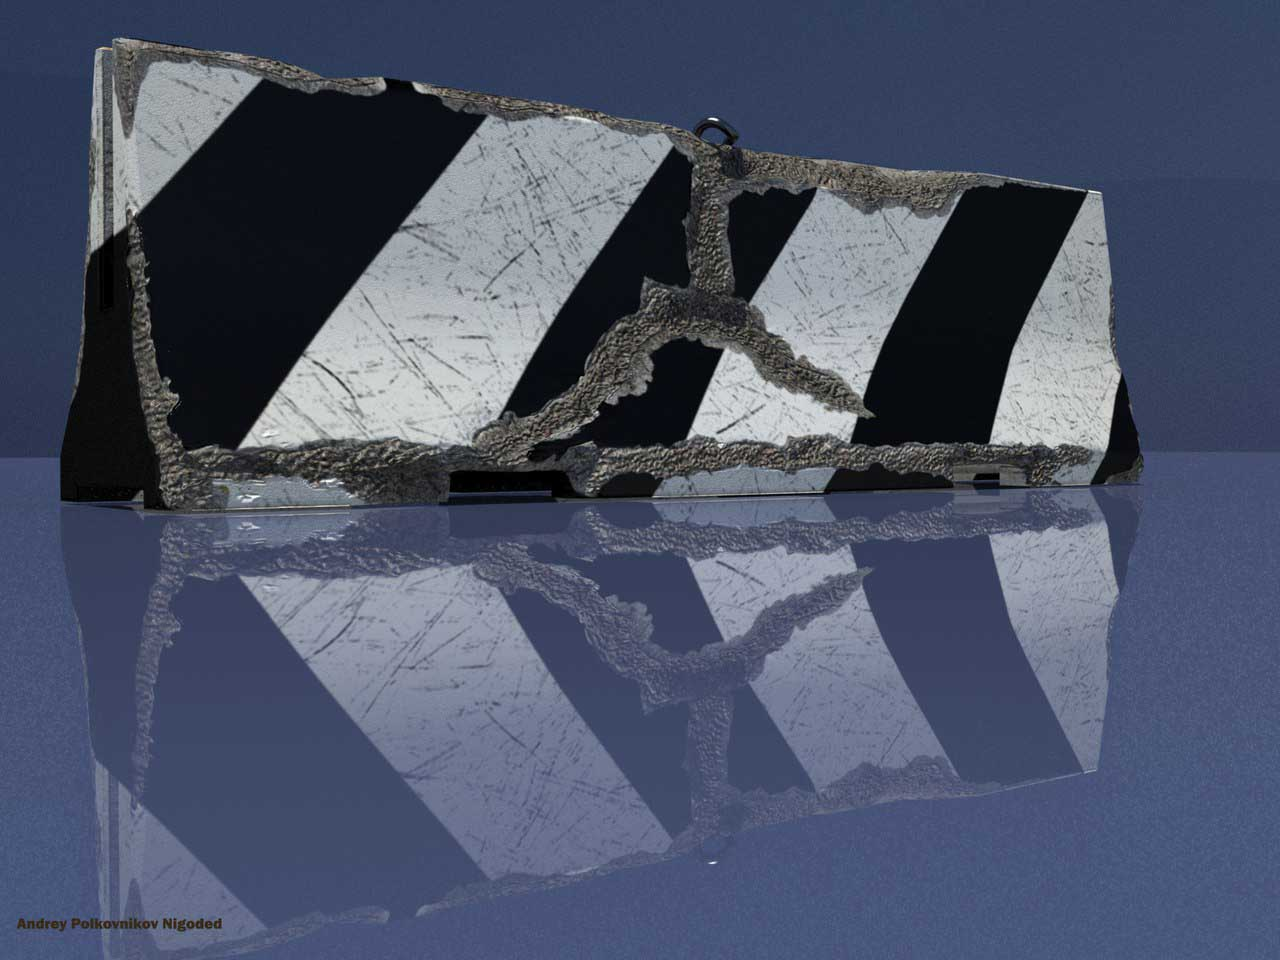 brick1 | 3d Environment, Props Artist. H\M\L poly. Classic, Tile, PBR. UV. Realistic\Casual, Render 2D.